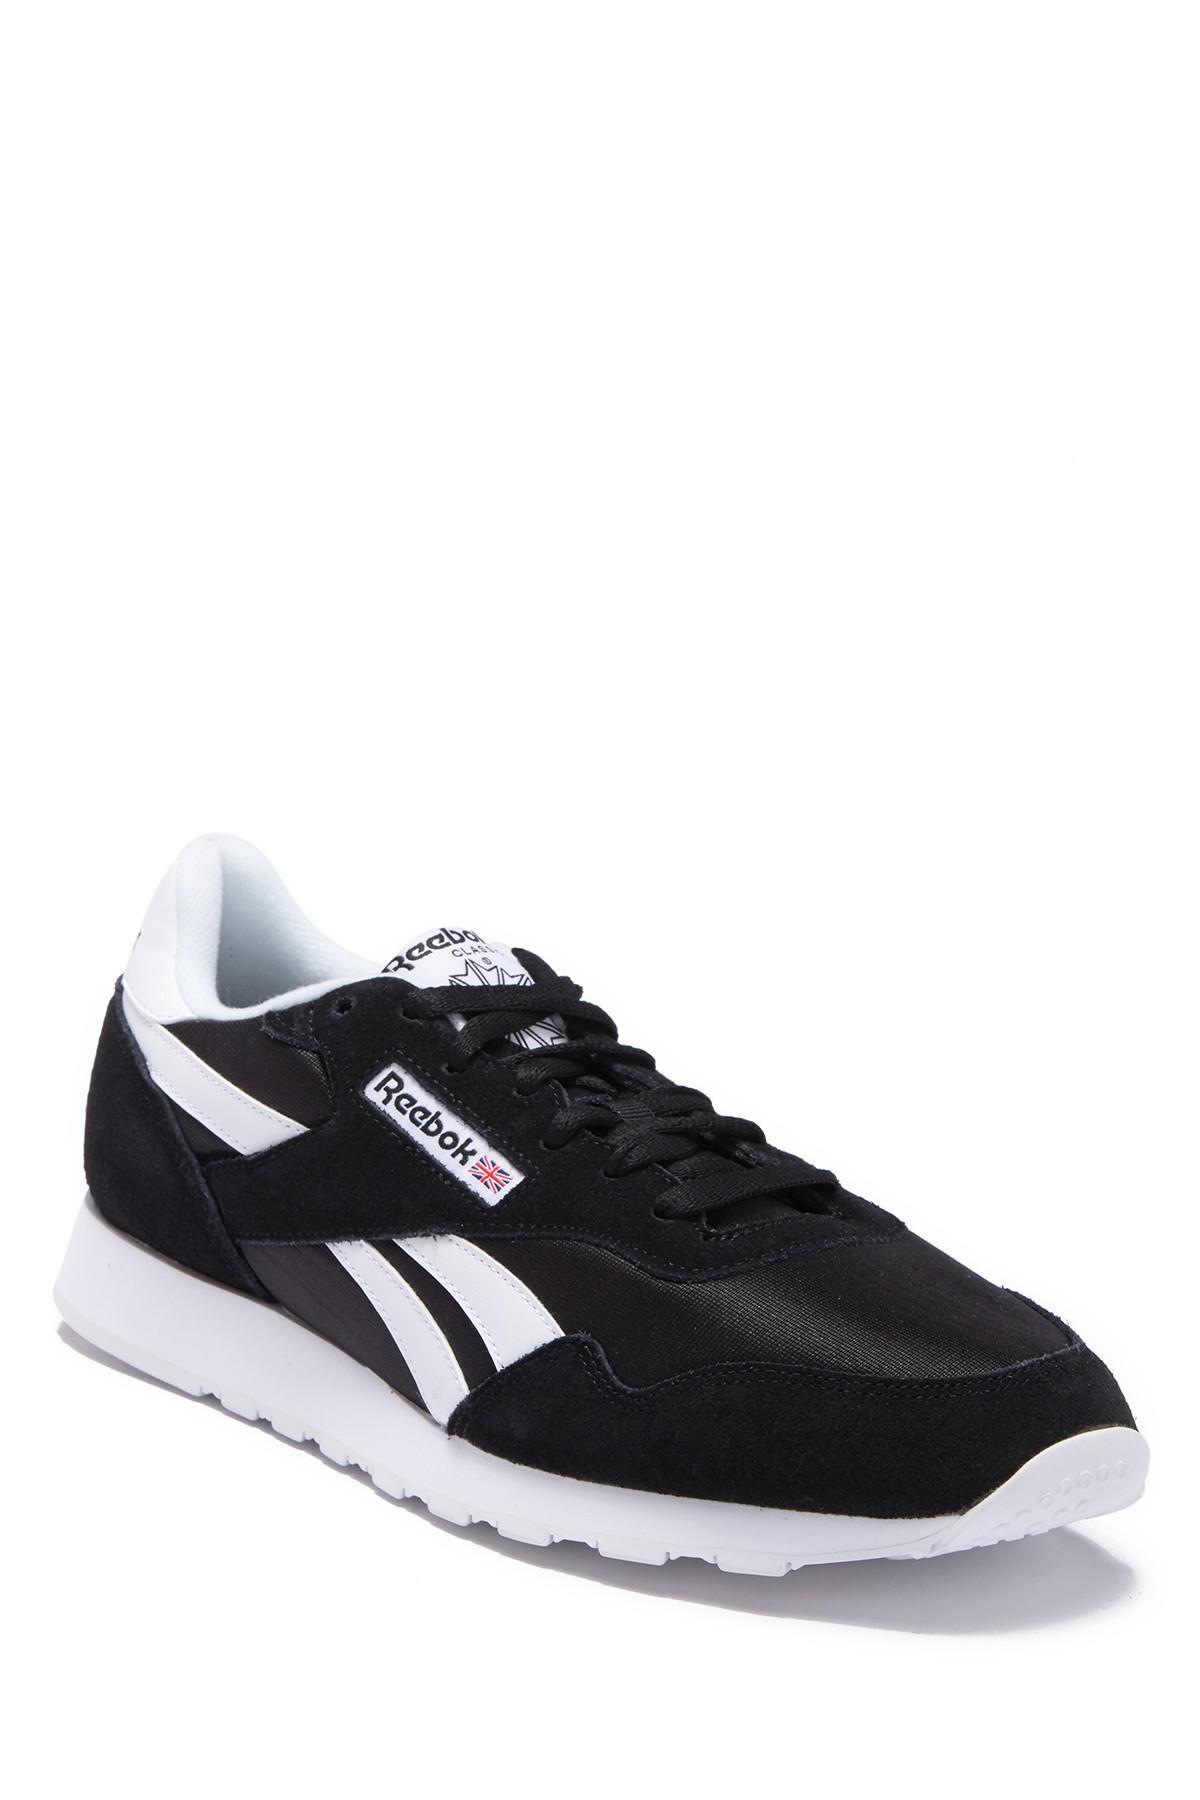 11d650015b78 Reebok - Black Royal Nylon Sneaker for Men - Lyst. View fullscreen